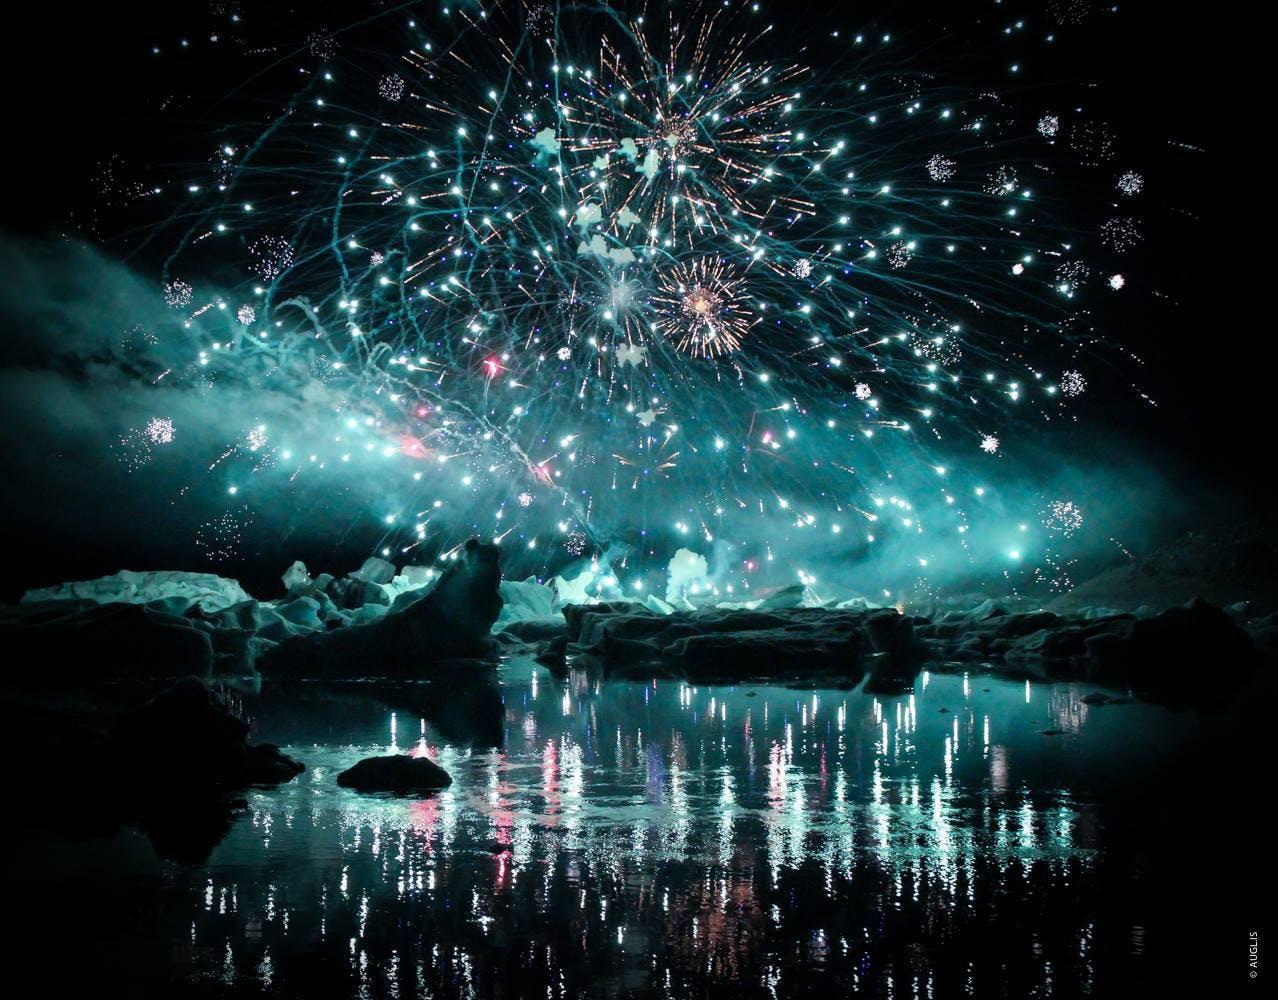 Fireworks show at Jökulsárlón - August 12, 2017